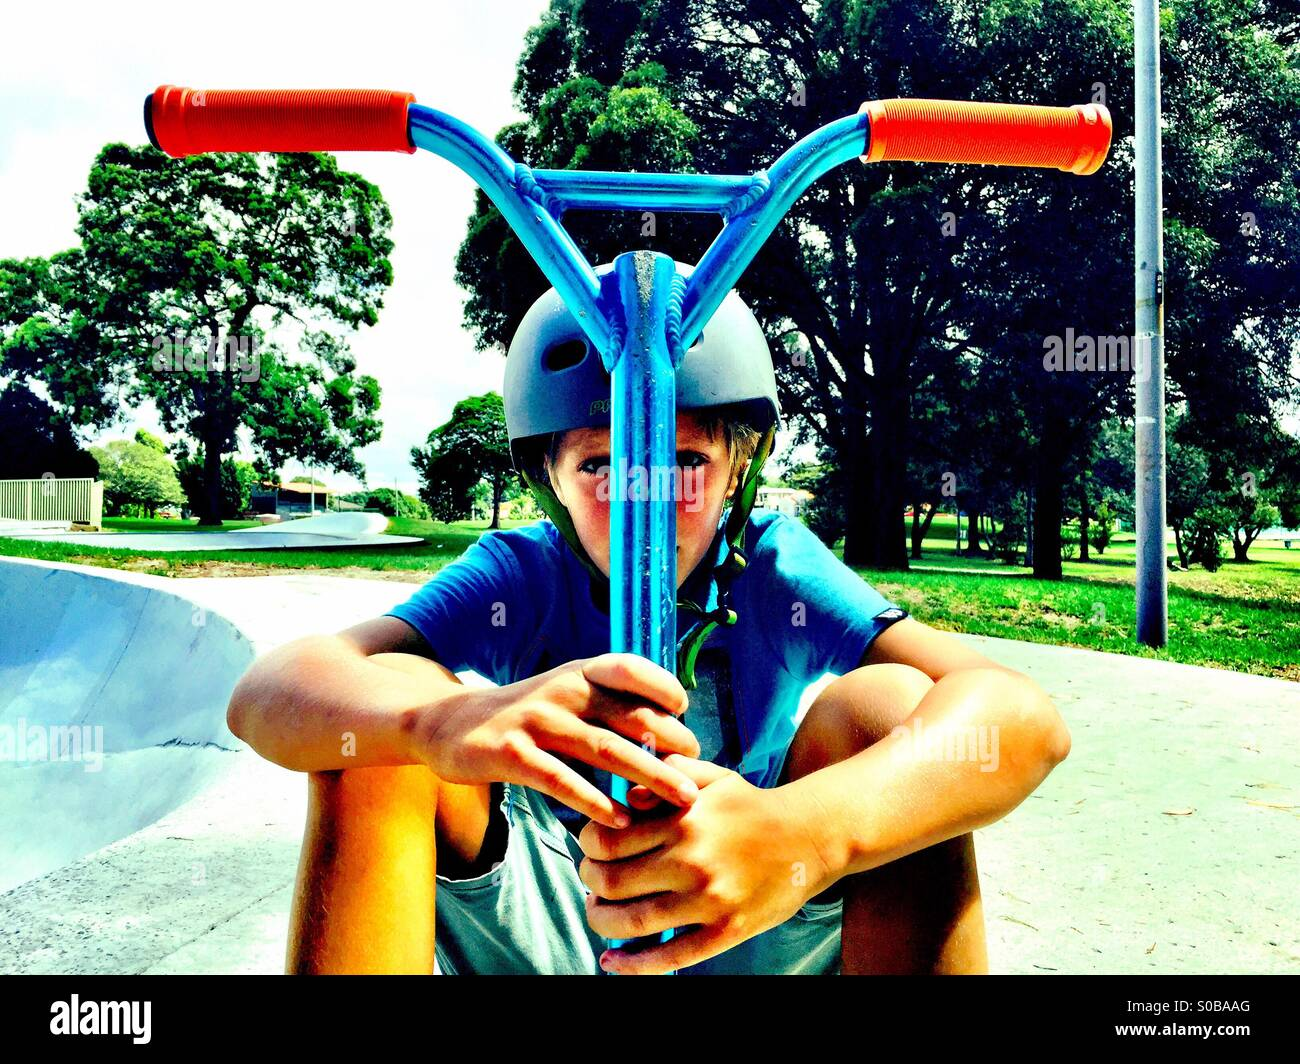 Un garçon de dix ans avec son scooter Photo Stock